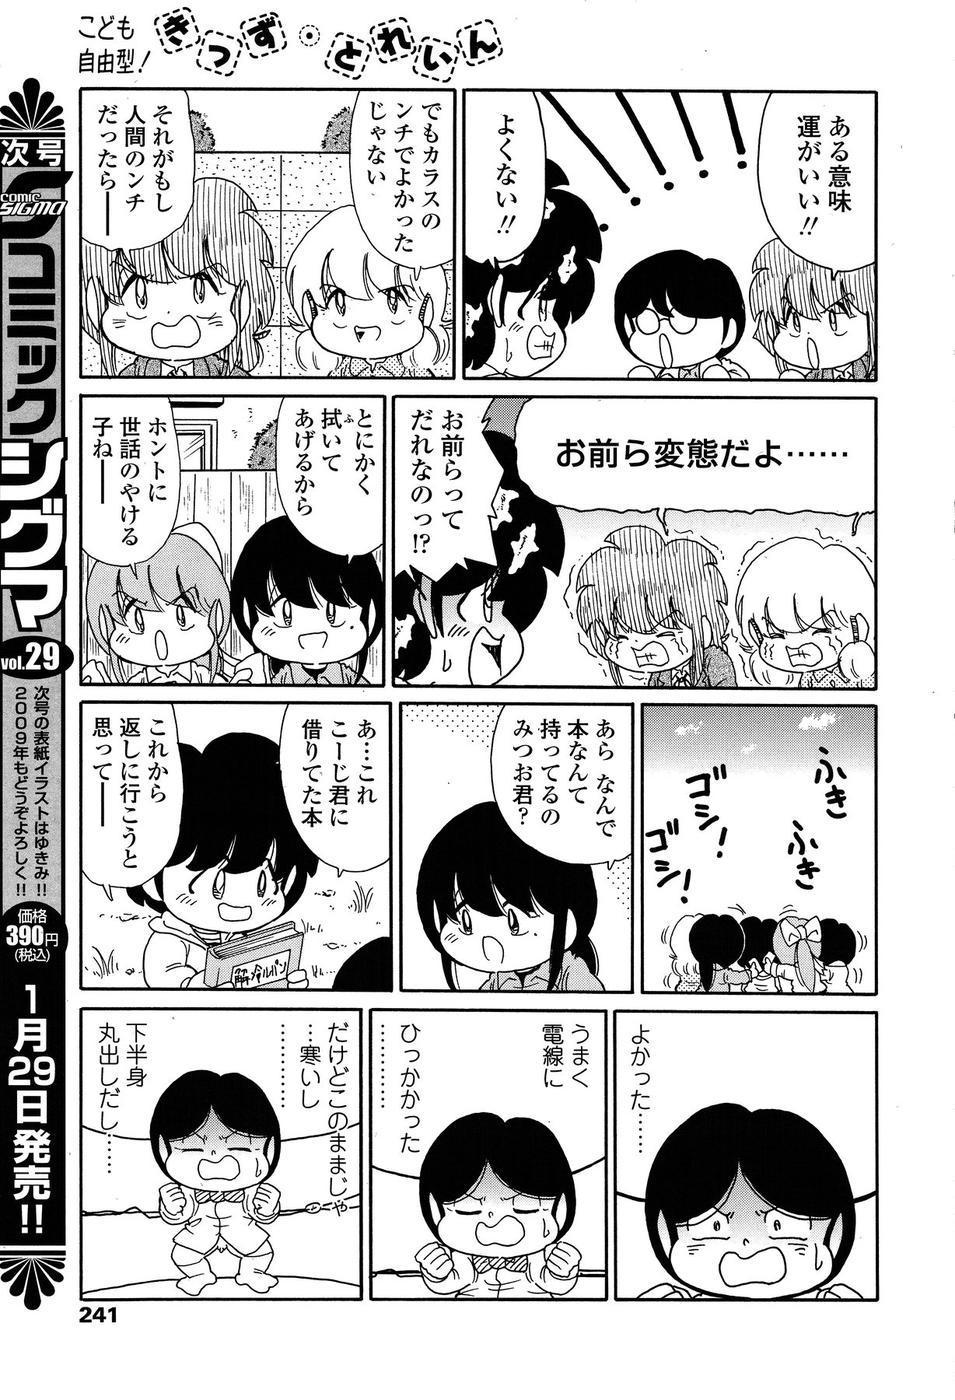 COMIC SIGMA 2009-01 Vol.28 145